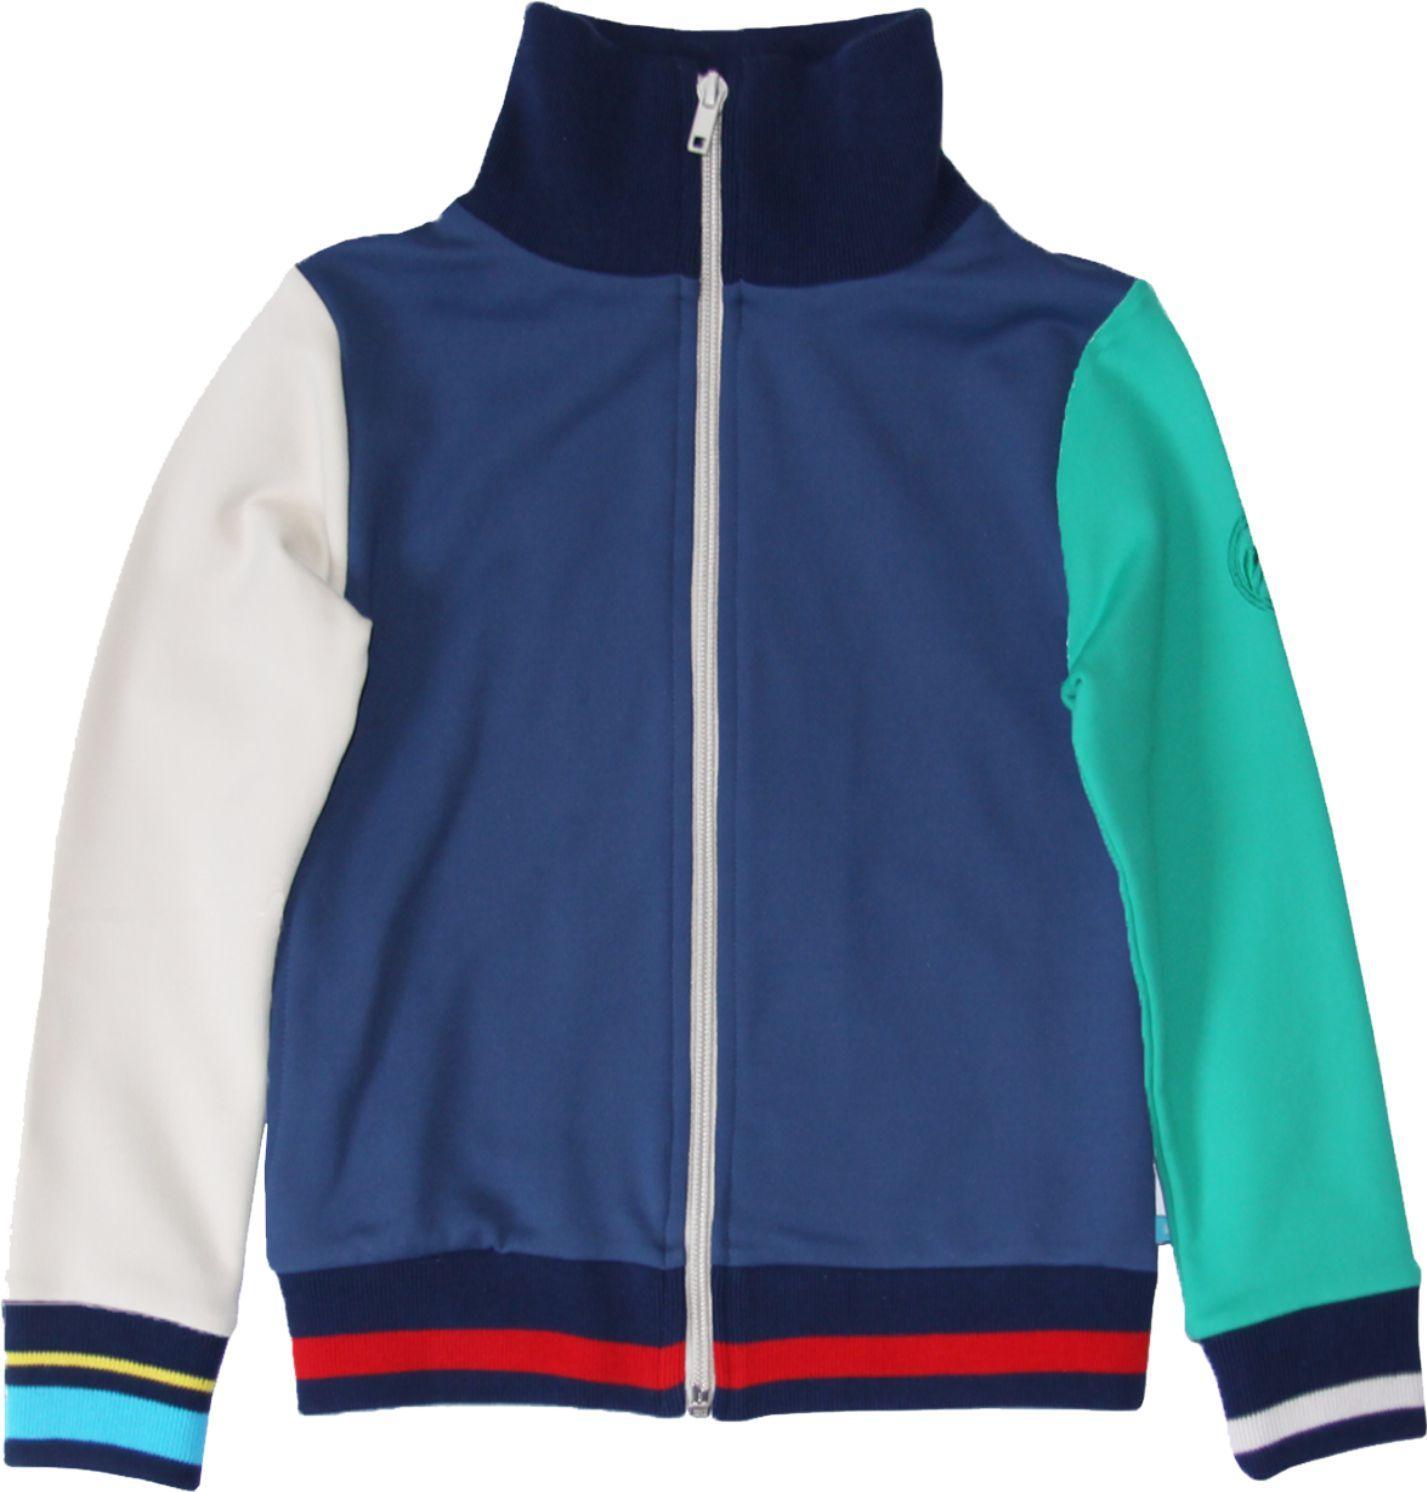 Sweats vintage cardigan multi coloured fwlc pinterest